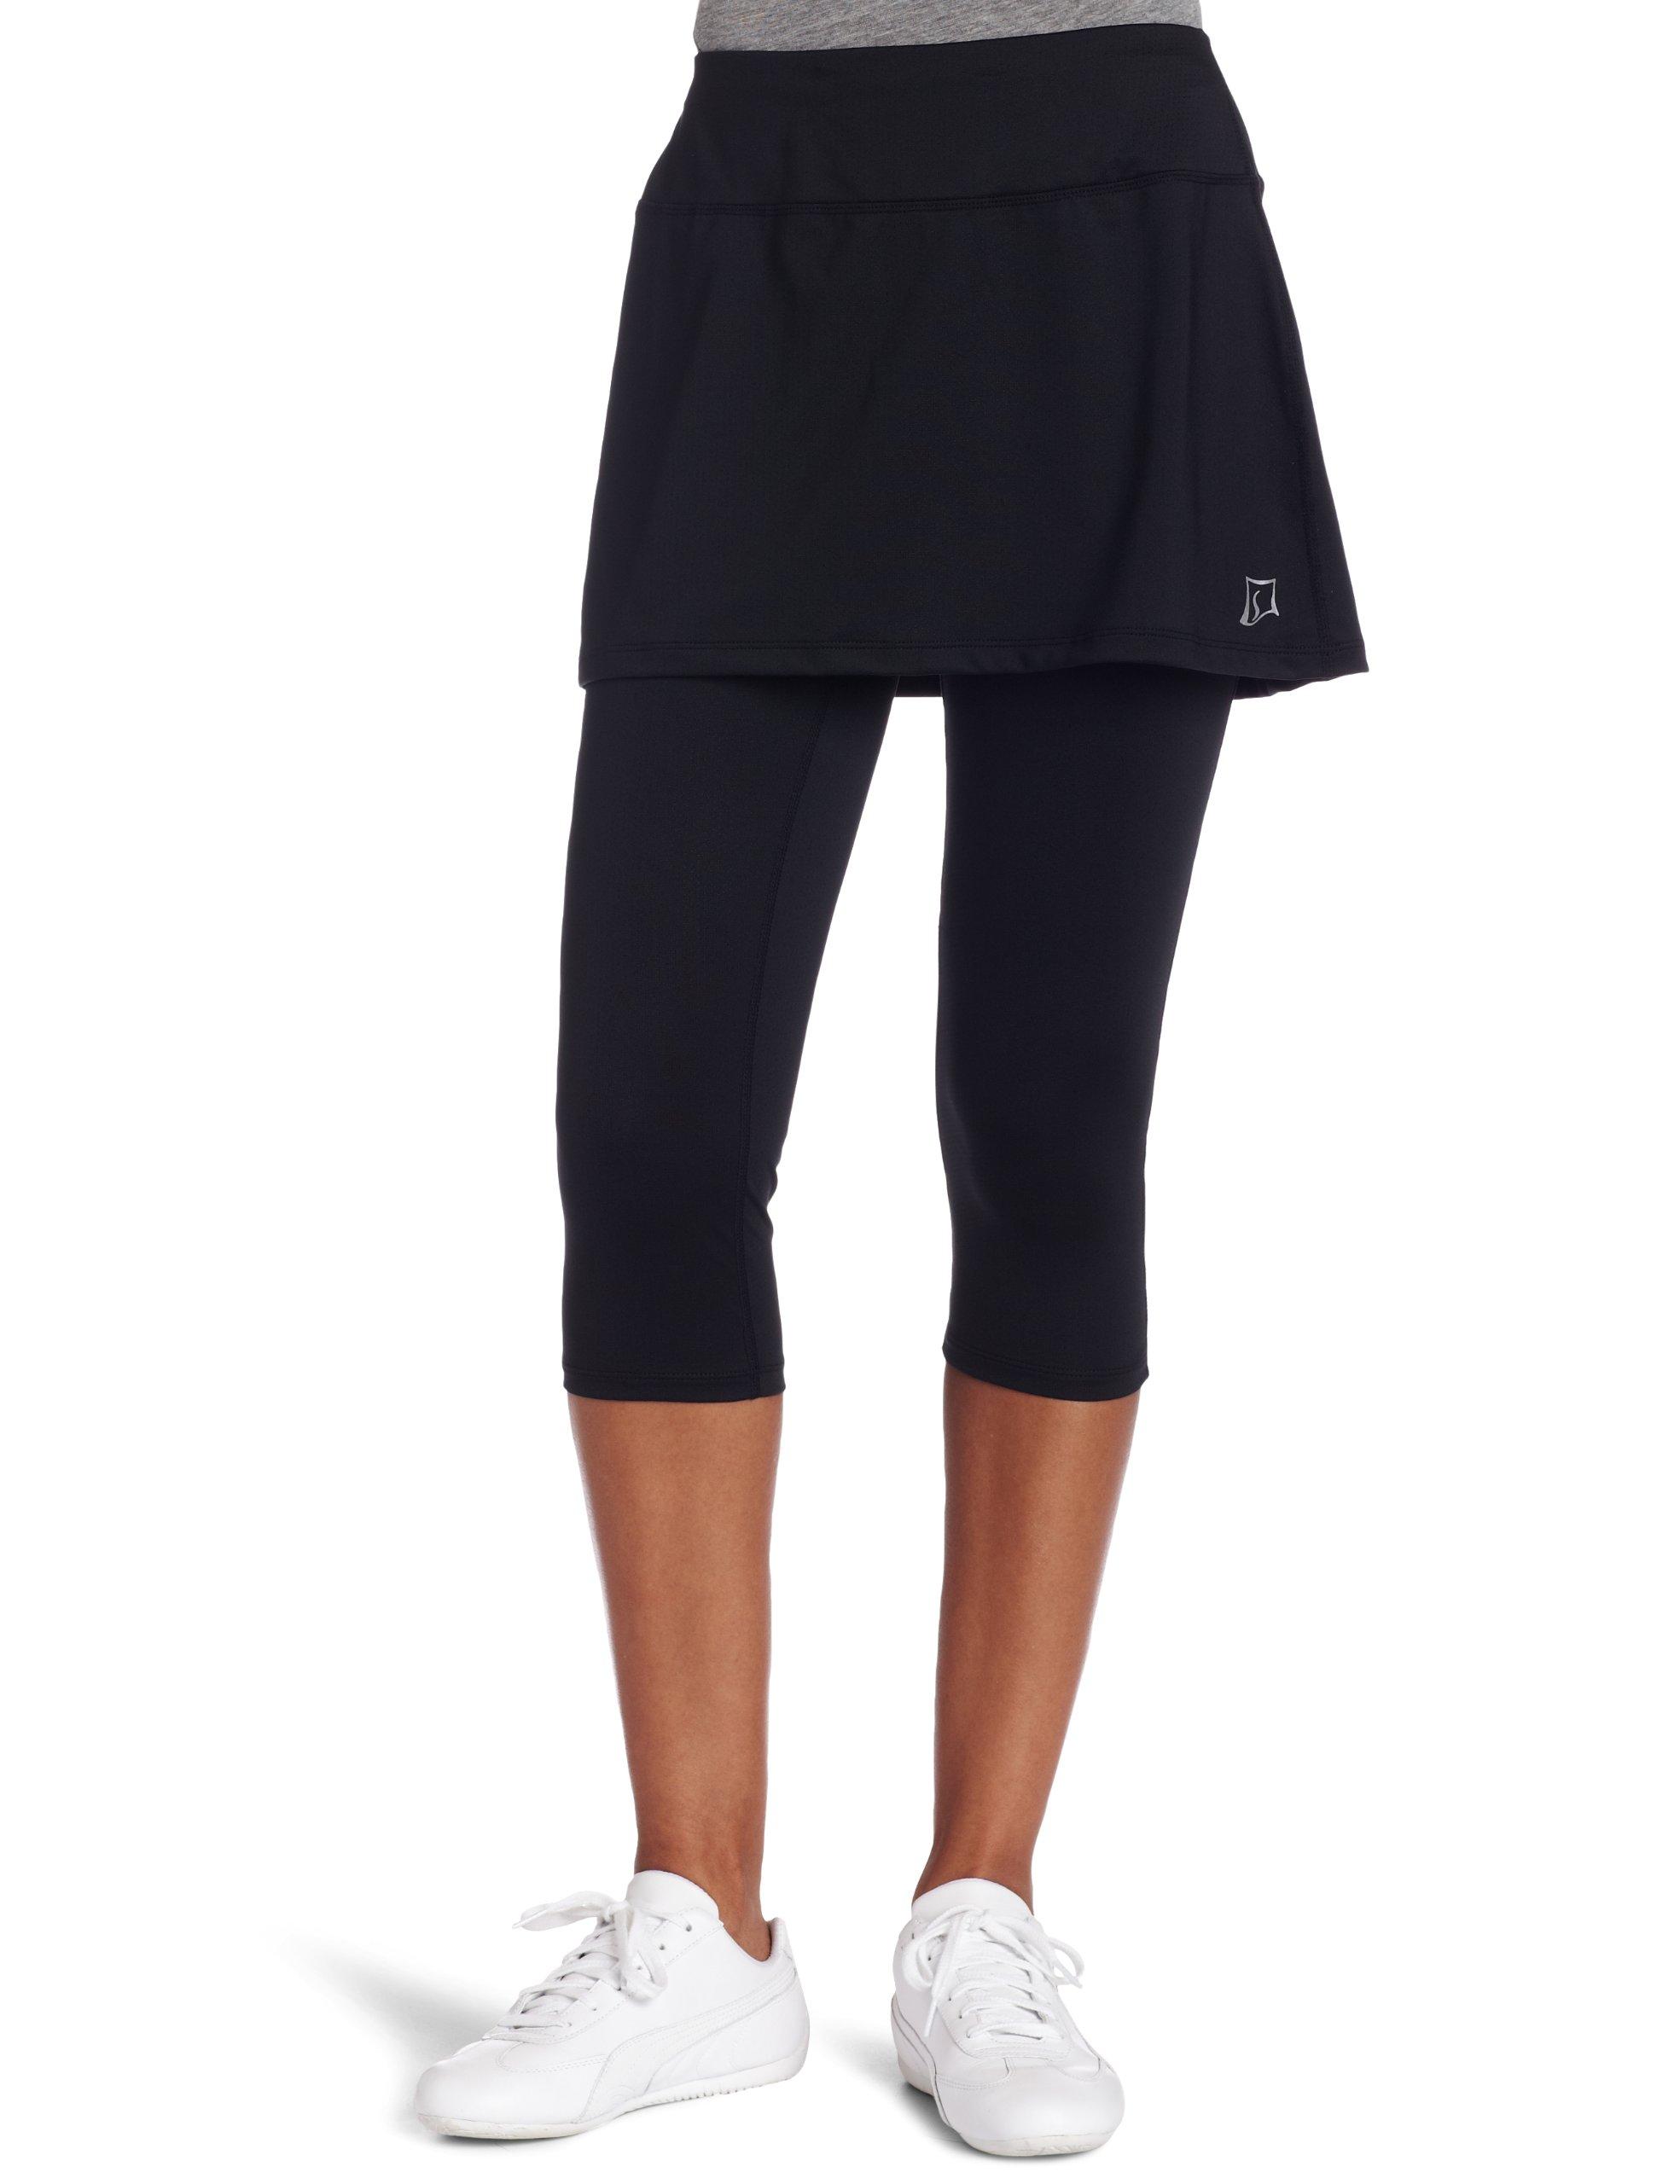 Skirt Sports Women's Lotta Breeze Capri Skirt, Black, Medium